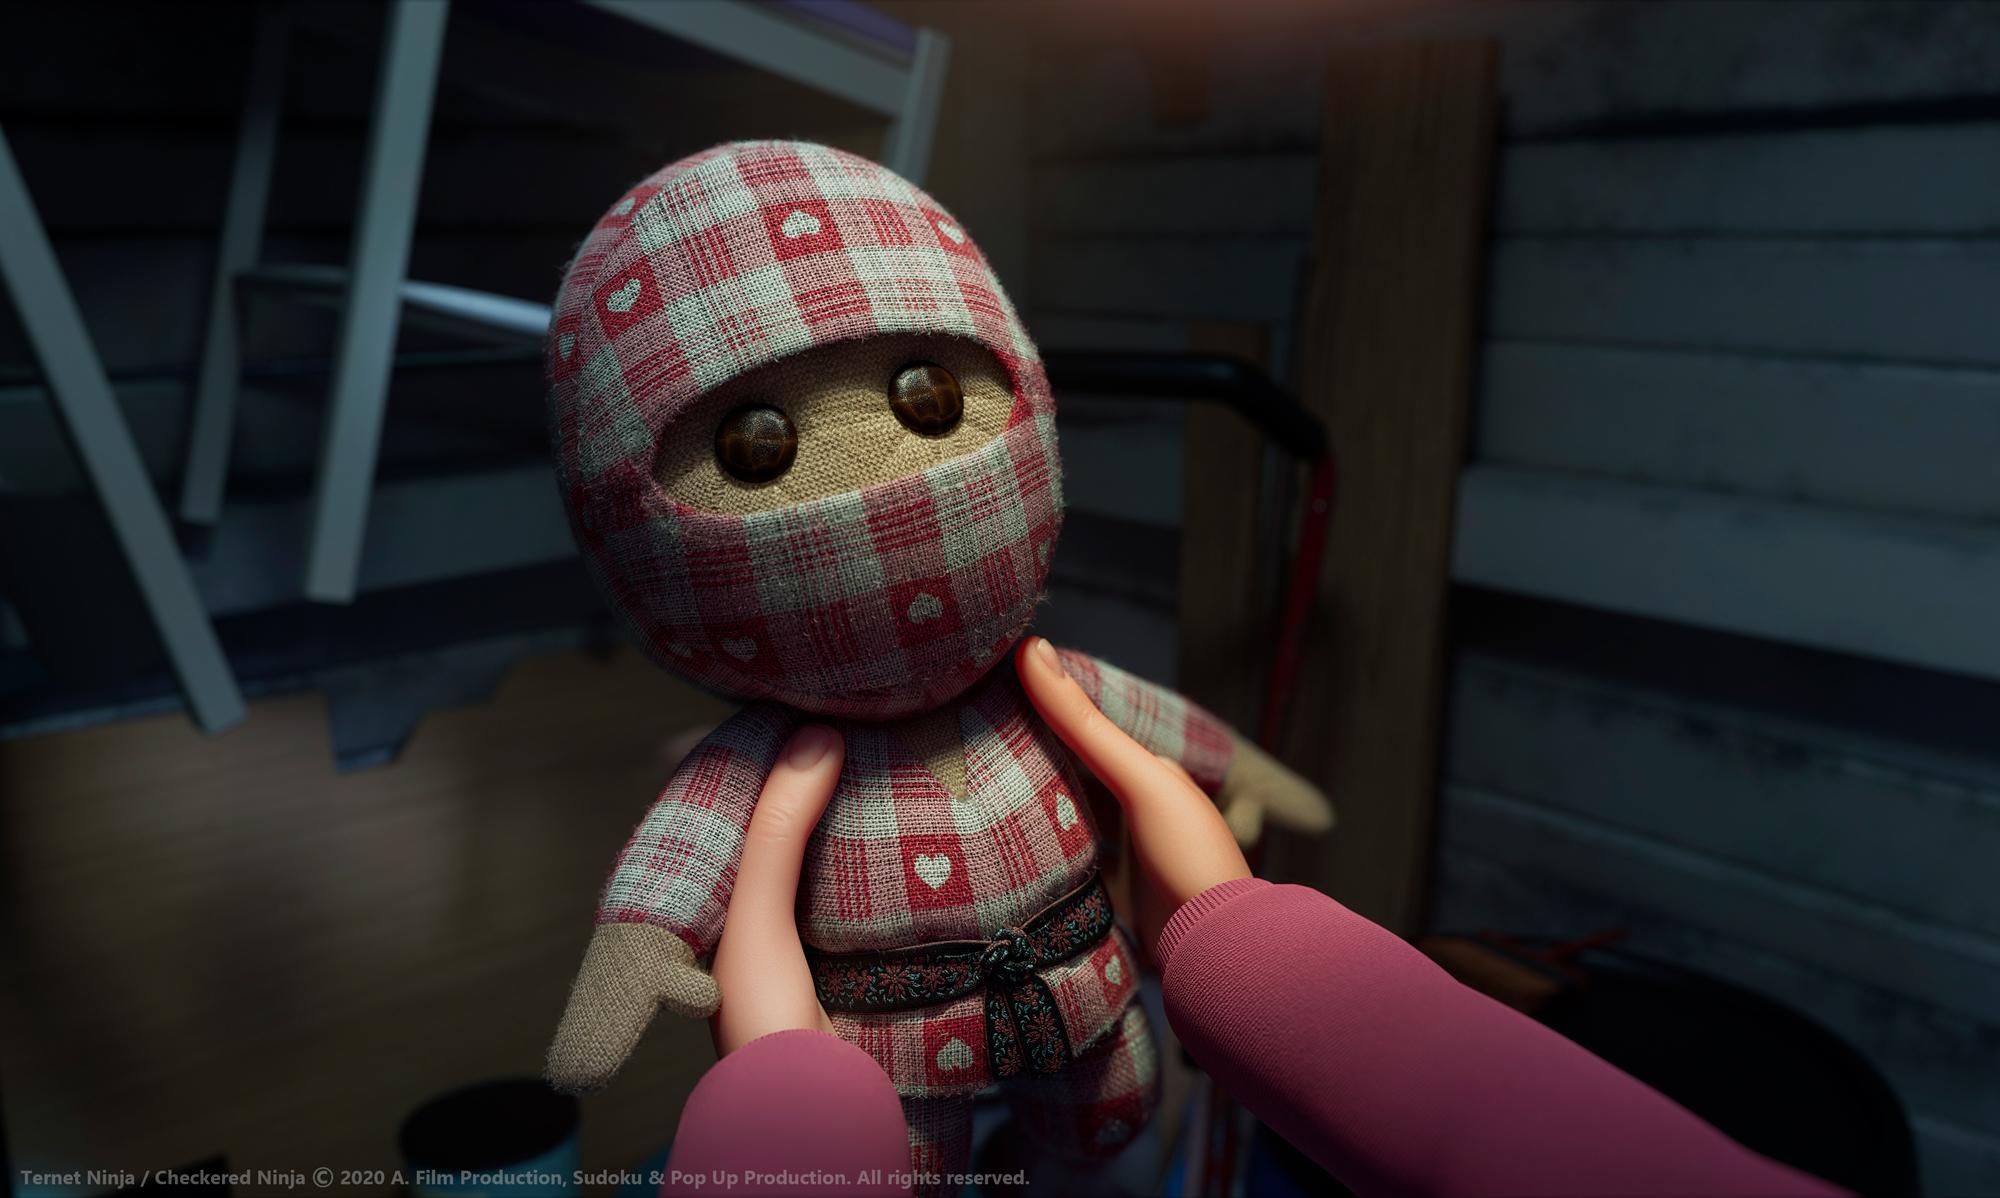 LevelK Boards Danish Animated Featured 'Checkered Ninja 2' (EXCLUSIVE)